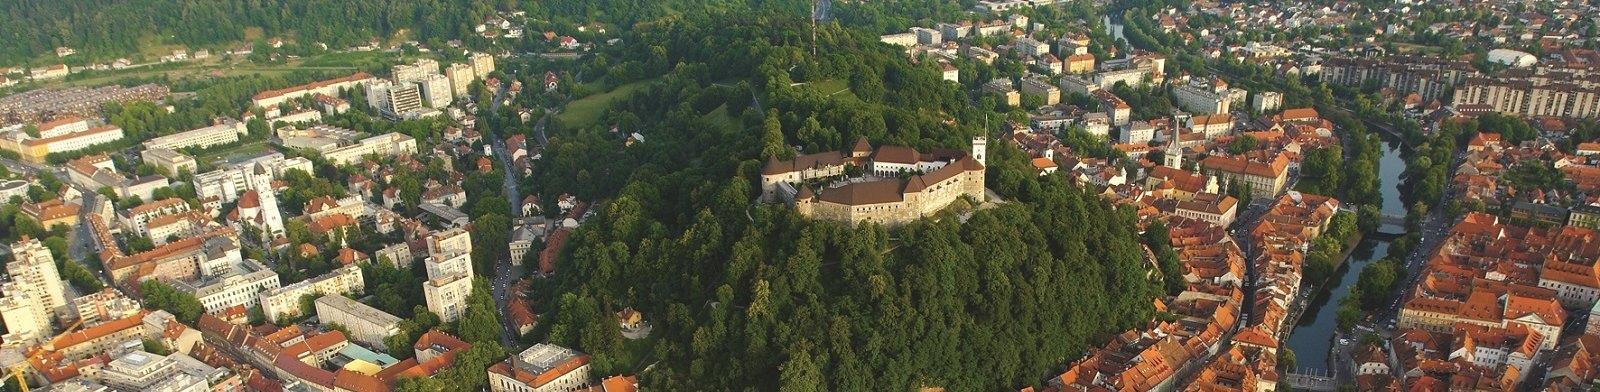 Ljubljana Old Town aerial view